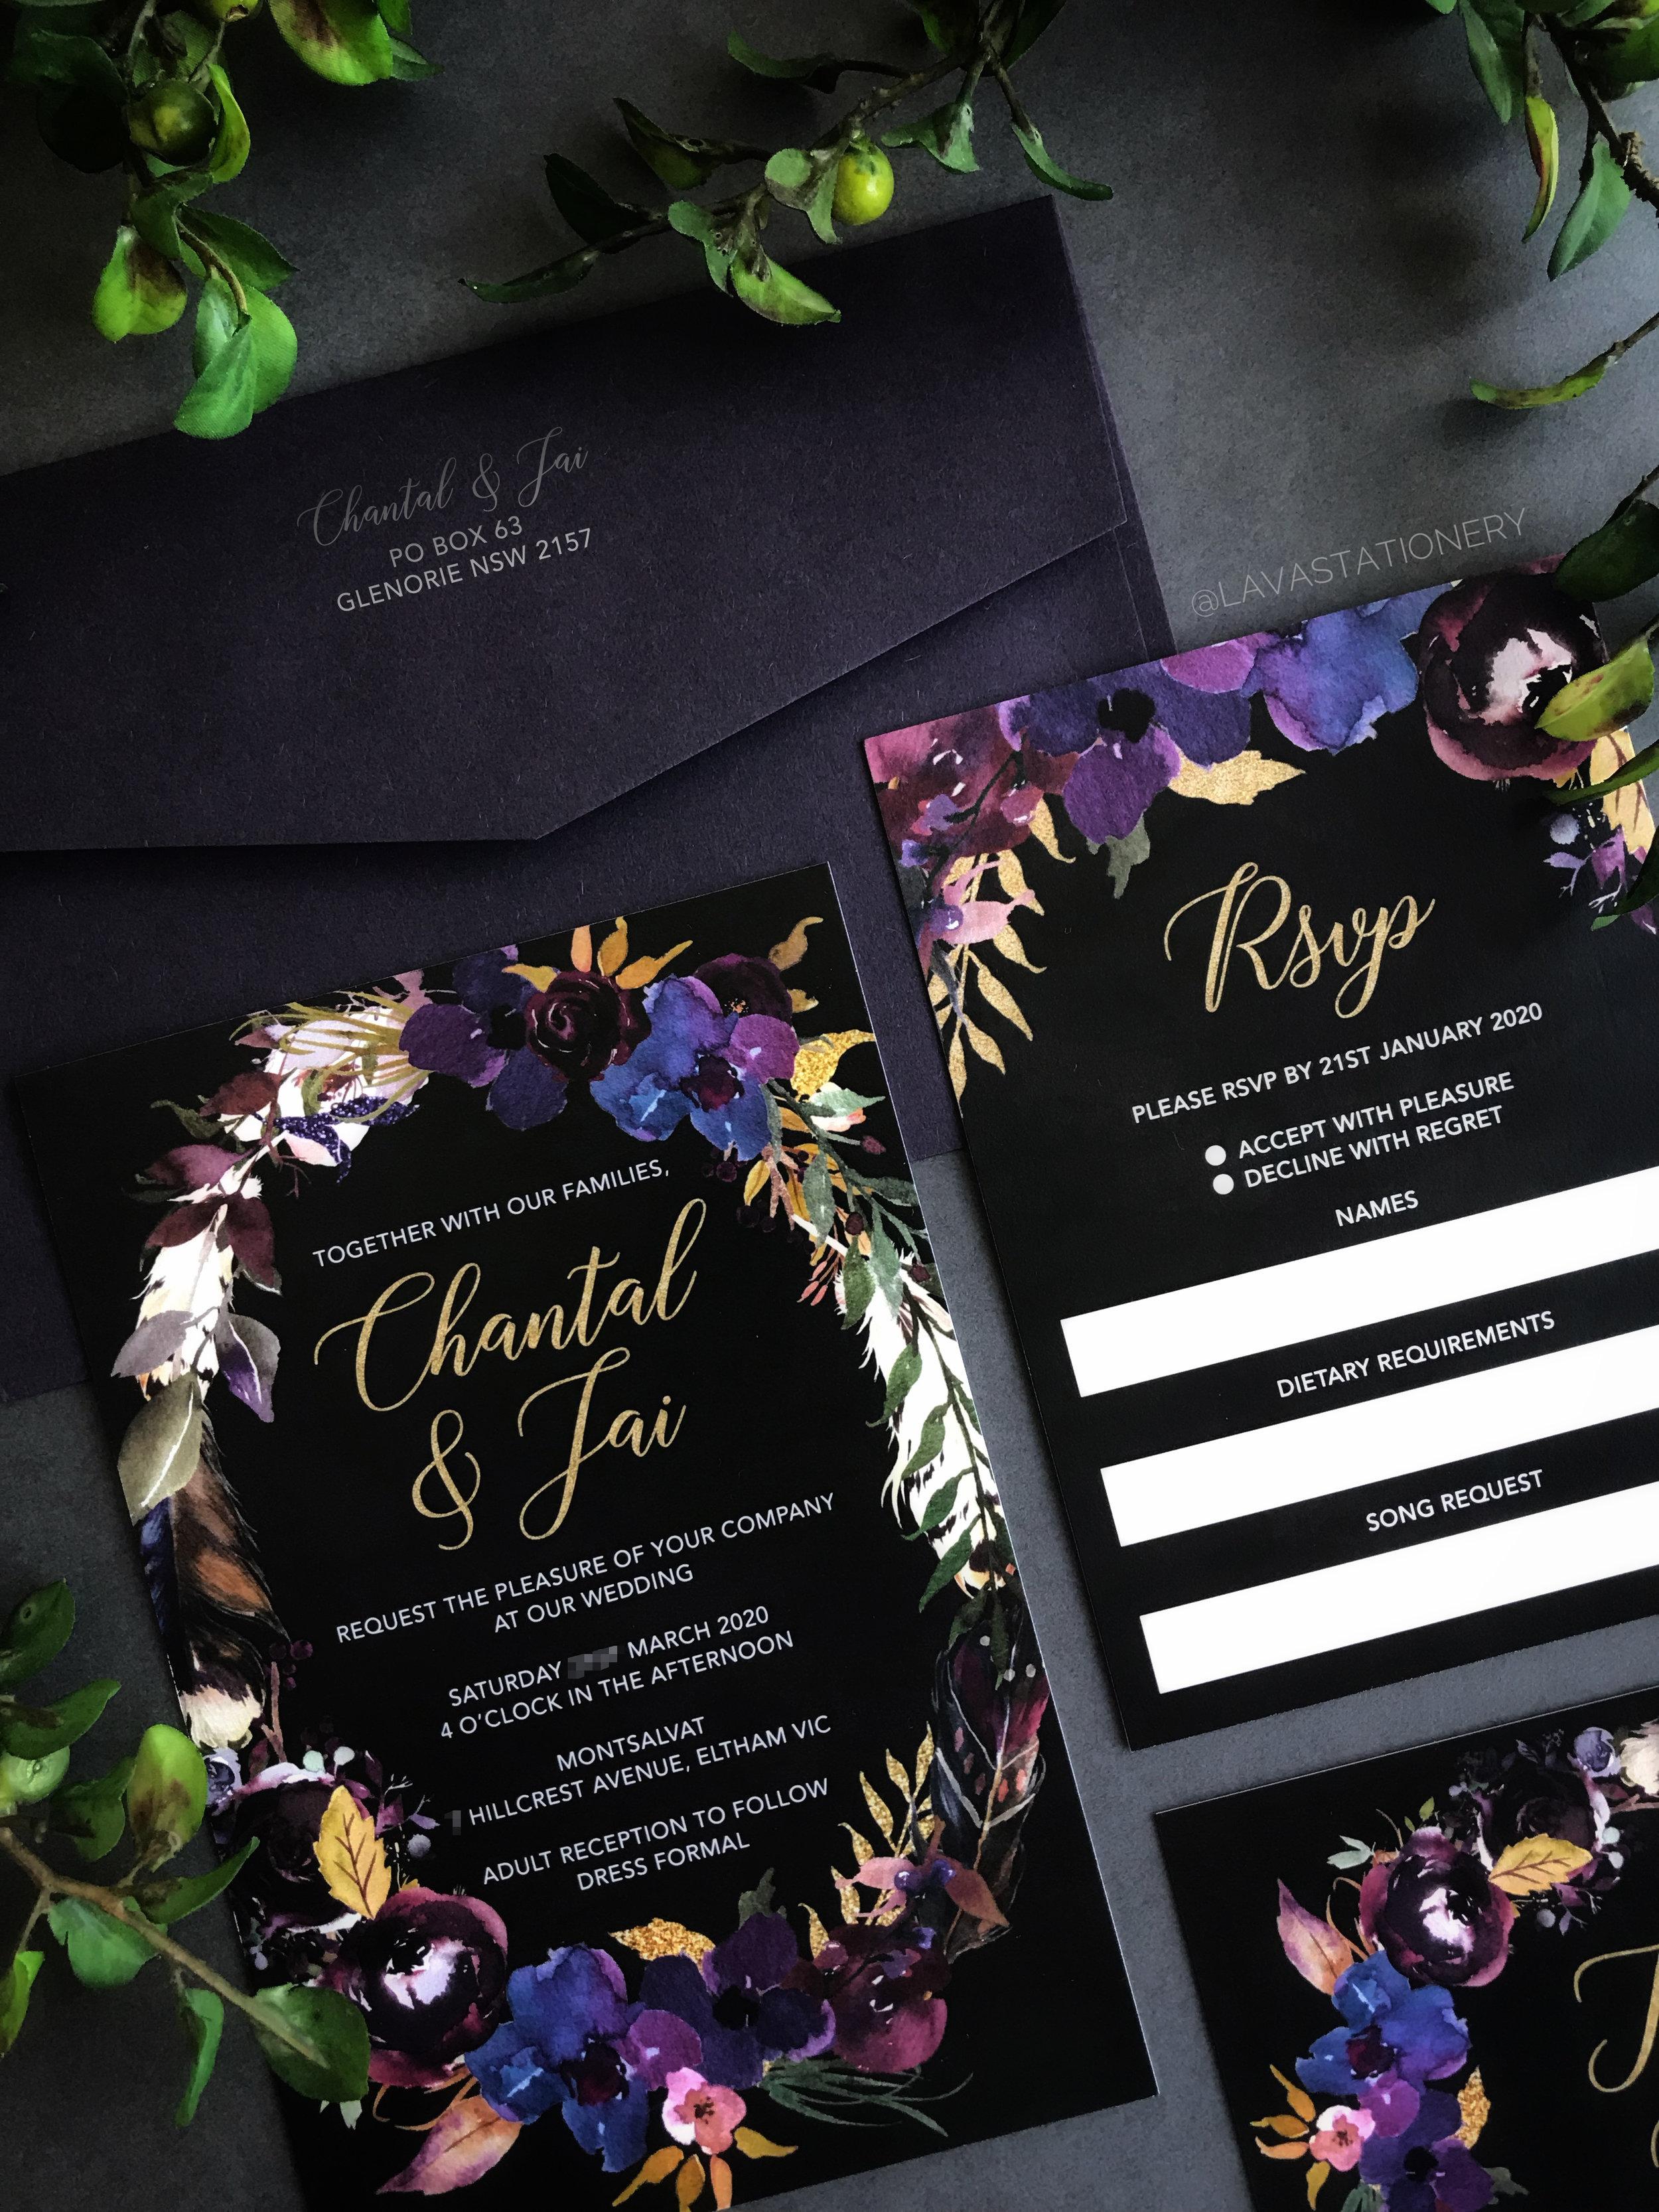 20191021---Chantal-and-Jai-Invitations.jpg